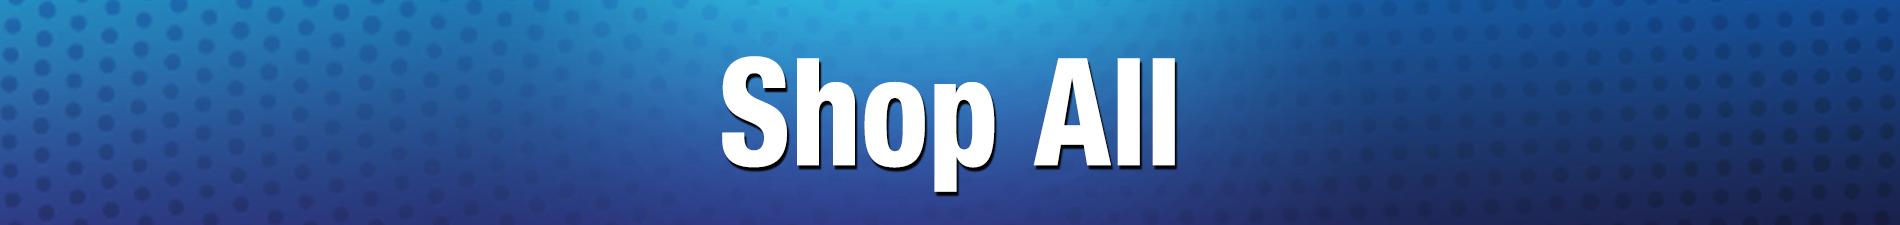 shop-all.jpg